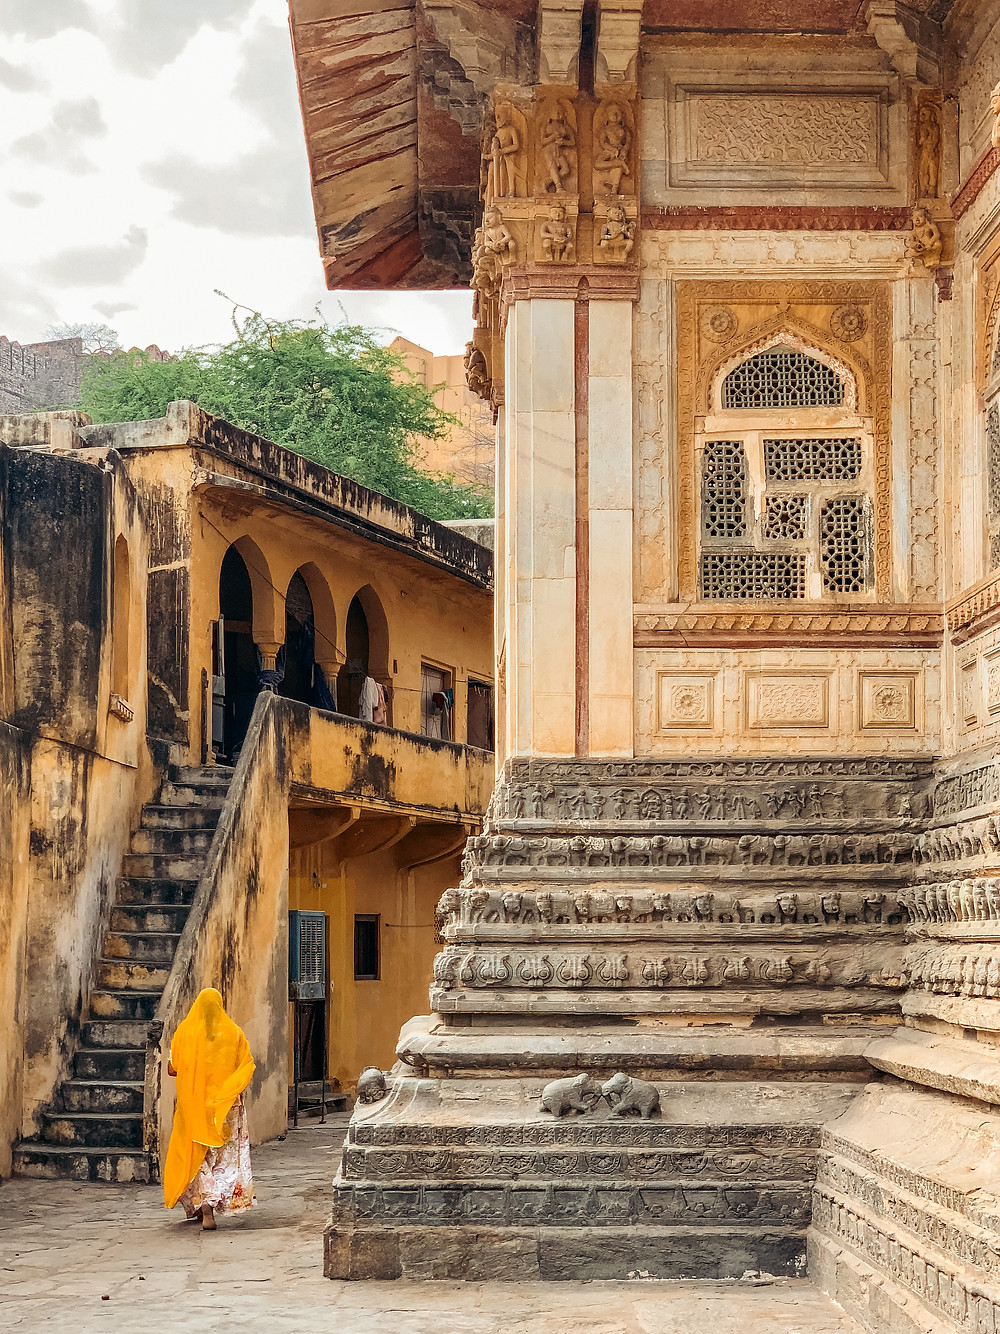 JAGAT SHIROMANI TEMPLE jaipur, hidden gems jaipur, non tourist places jaipur, free things to do in jaipur, hindu temples jaipur